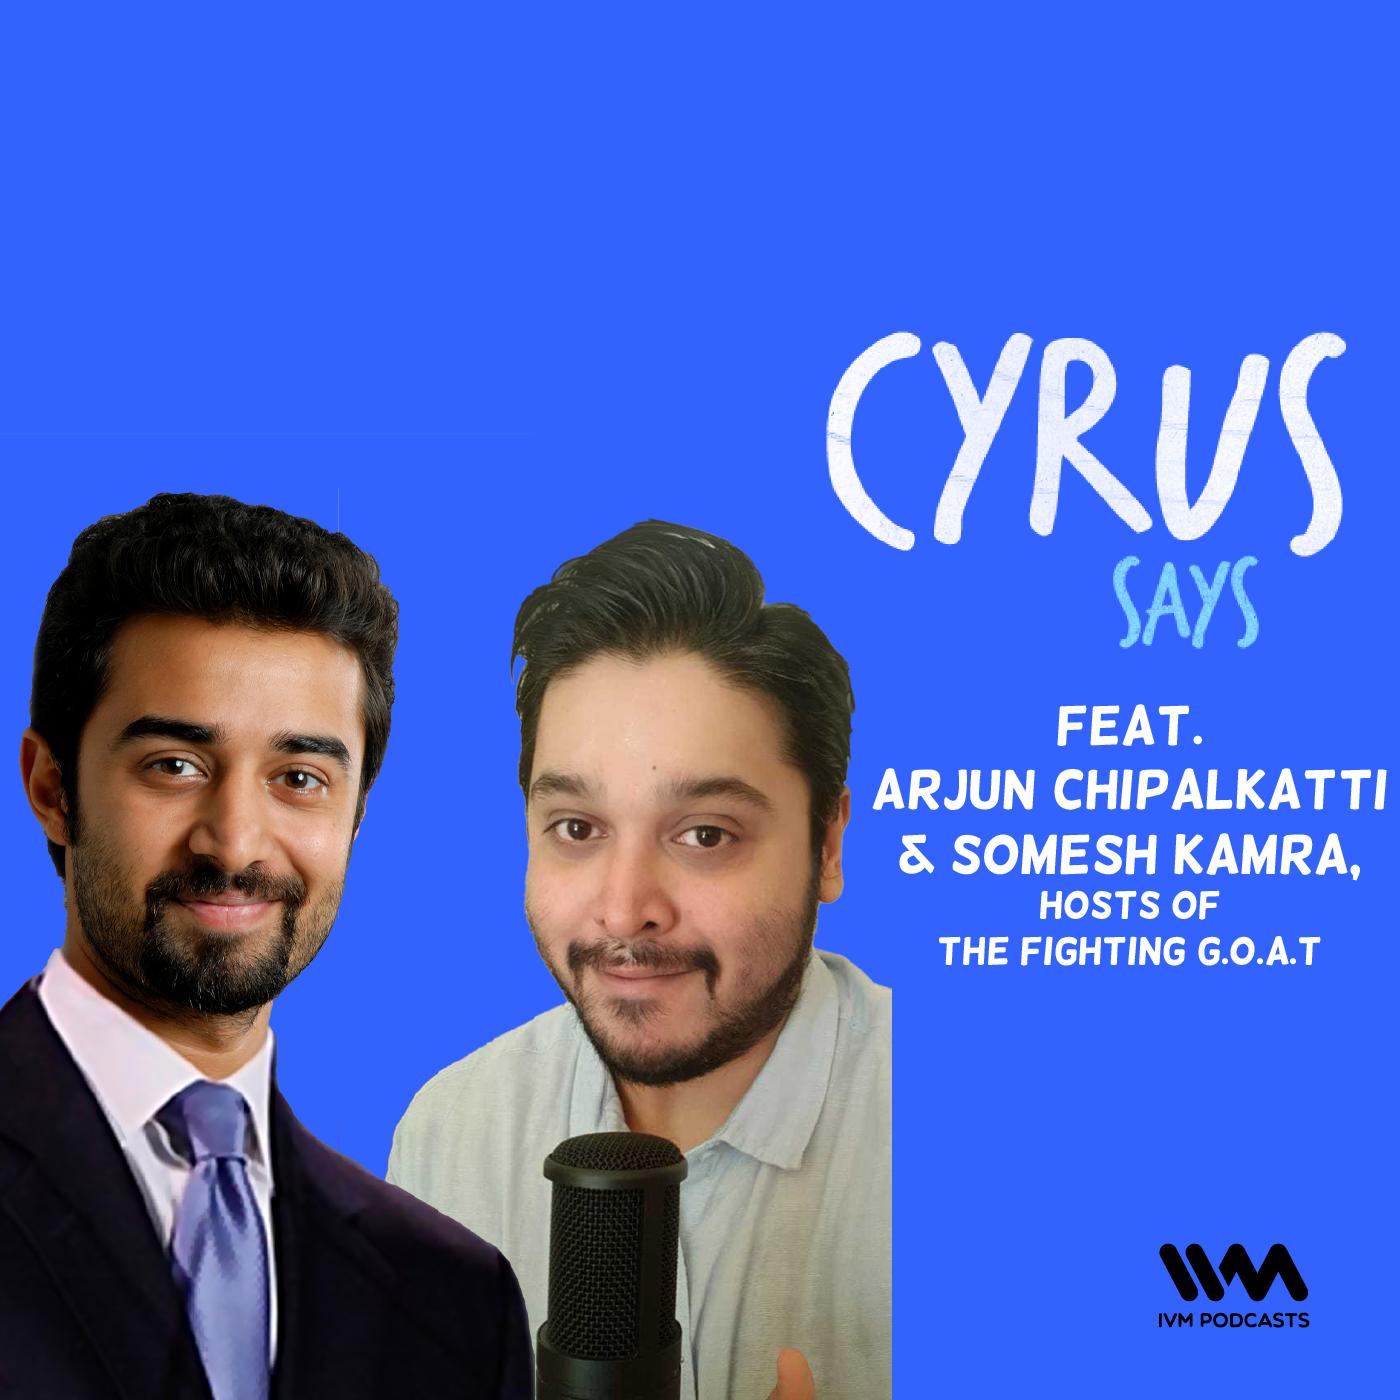 Ep. 639: feat. Arjun Chipalkatti & Somesh Kamra